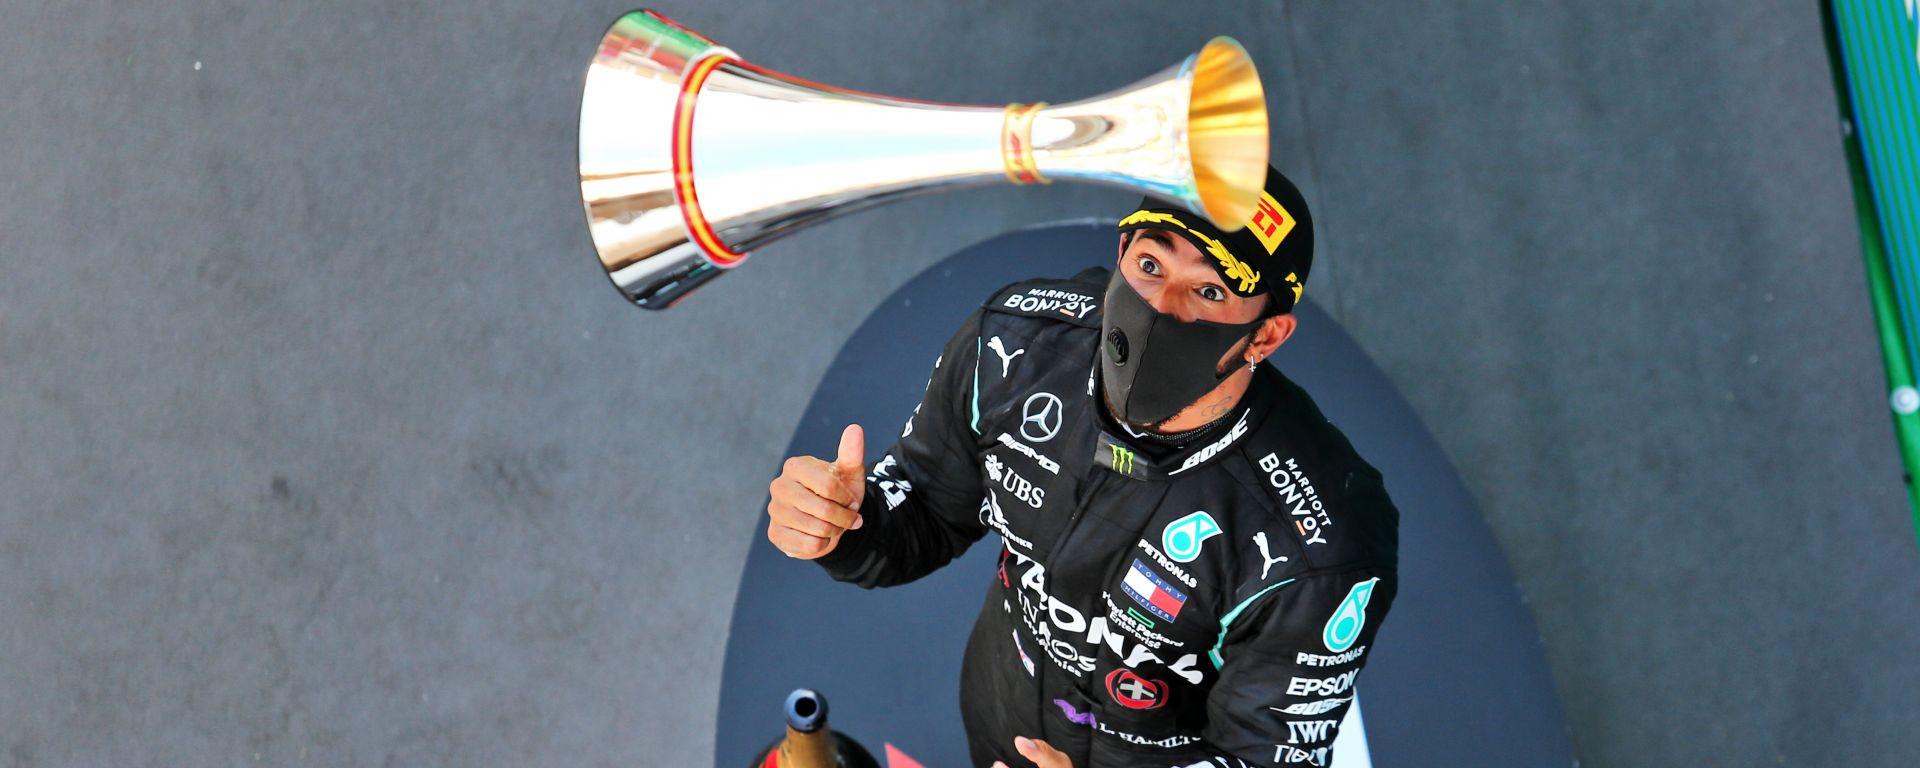 F1, GP Spagna 2020: Lewis Hamilton (Mercedes) festeggia la vittoria